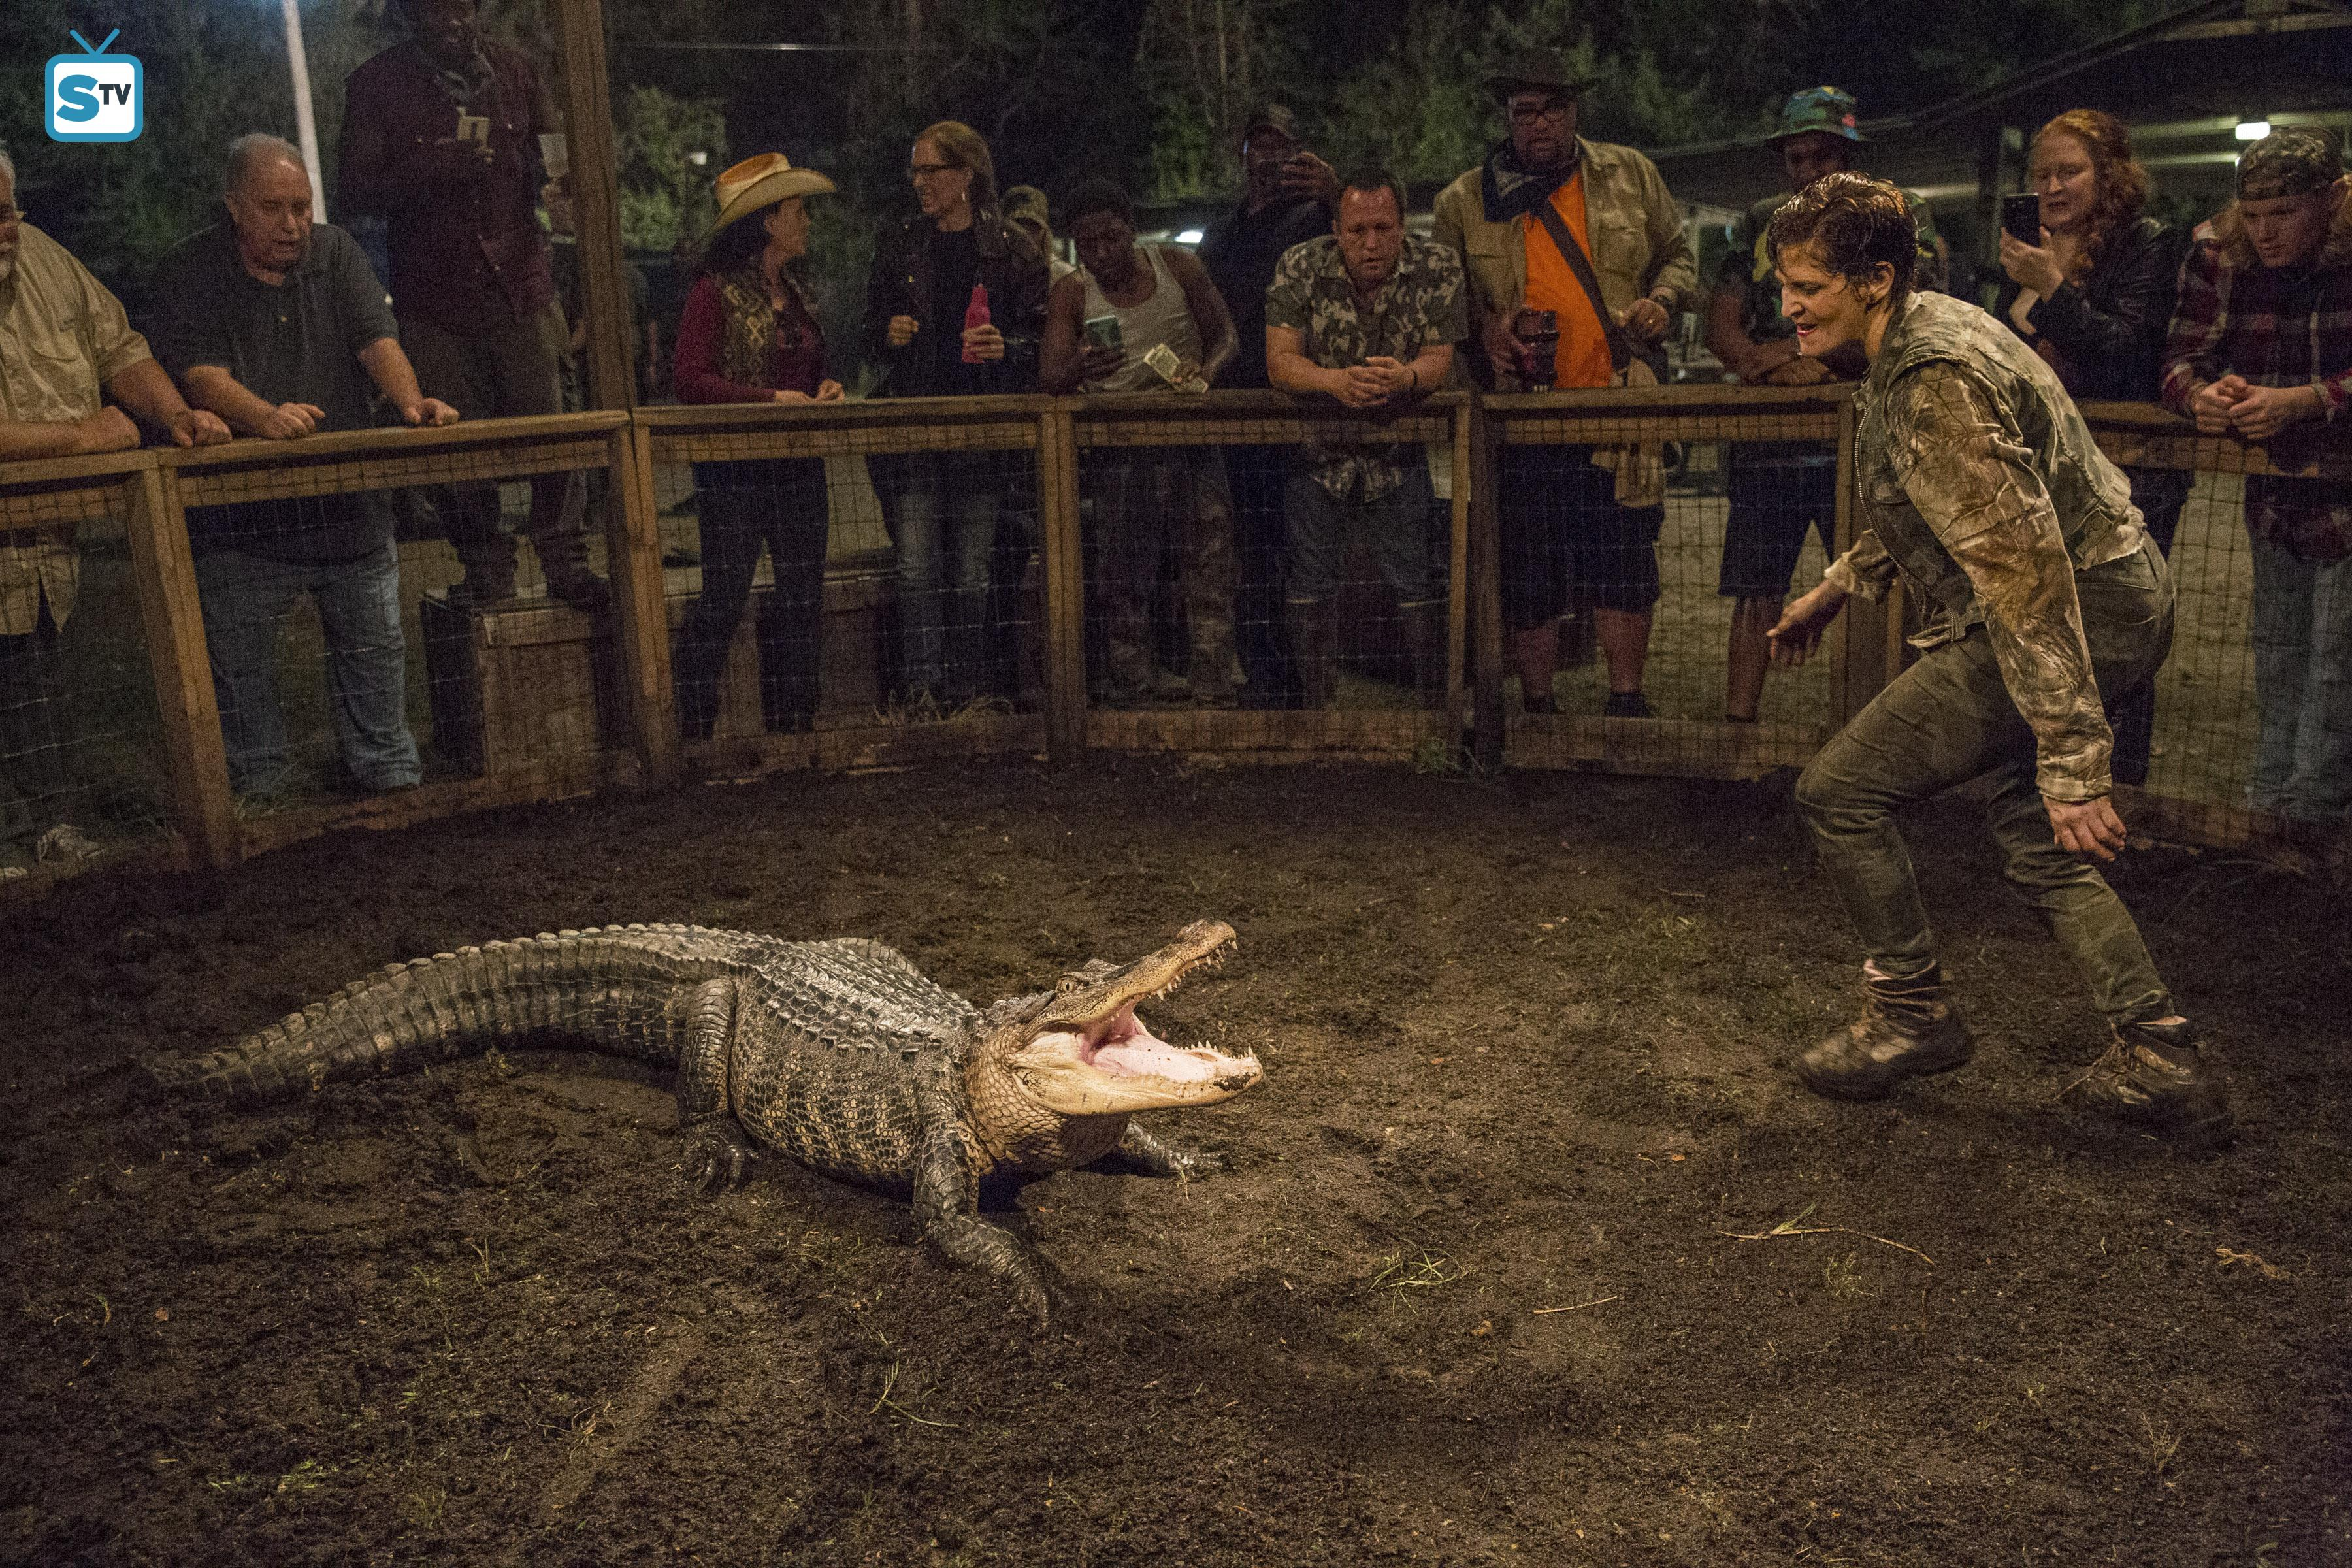 1x03 'Quicksand' Promotional foto